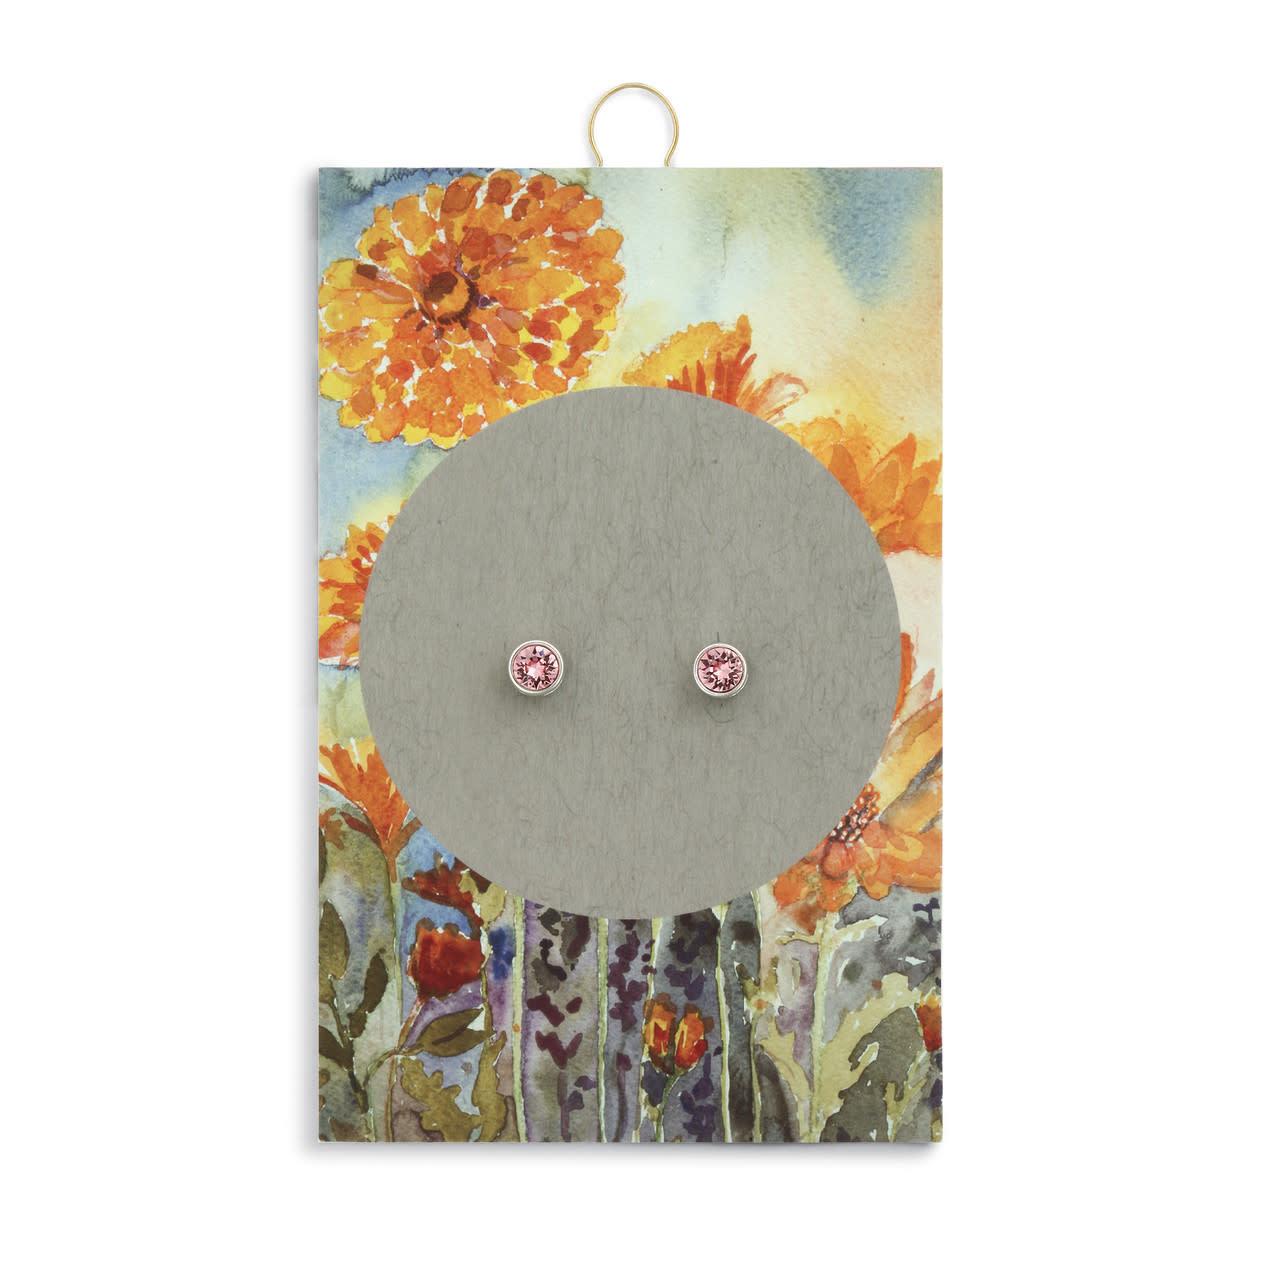 Fleurish Home Simply Birthstone Earrings - October